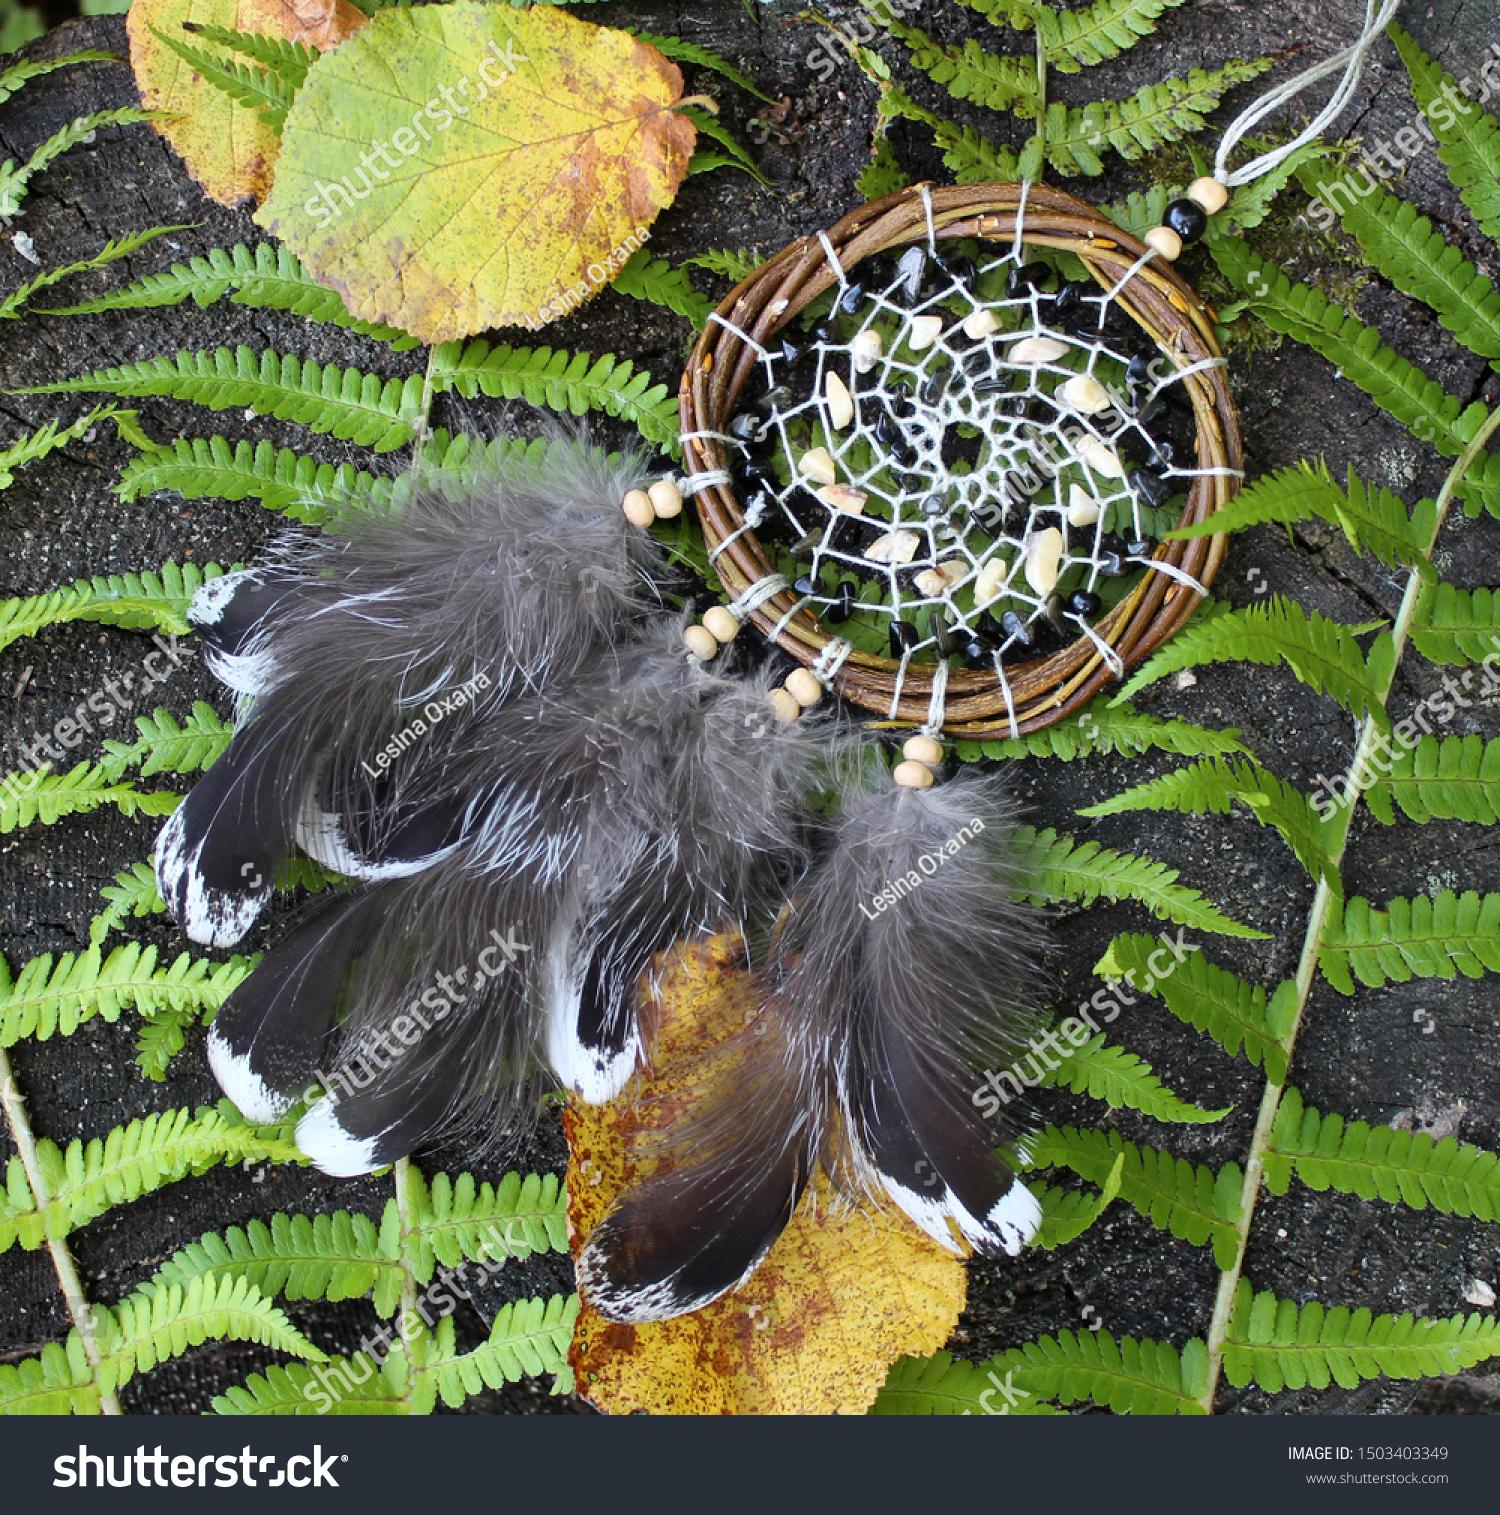 Dreamcatcher Native American Amulet Home Decor Stock Photo Edit Now 1503403349